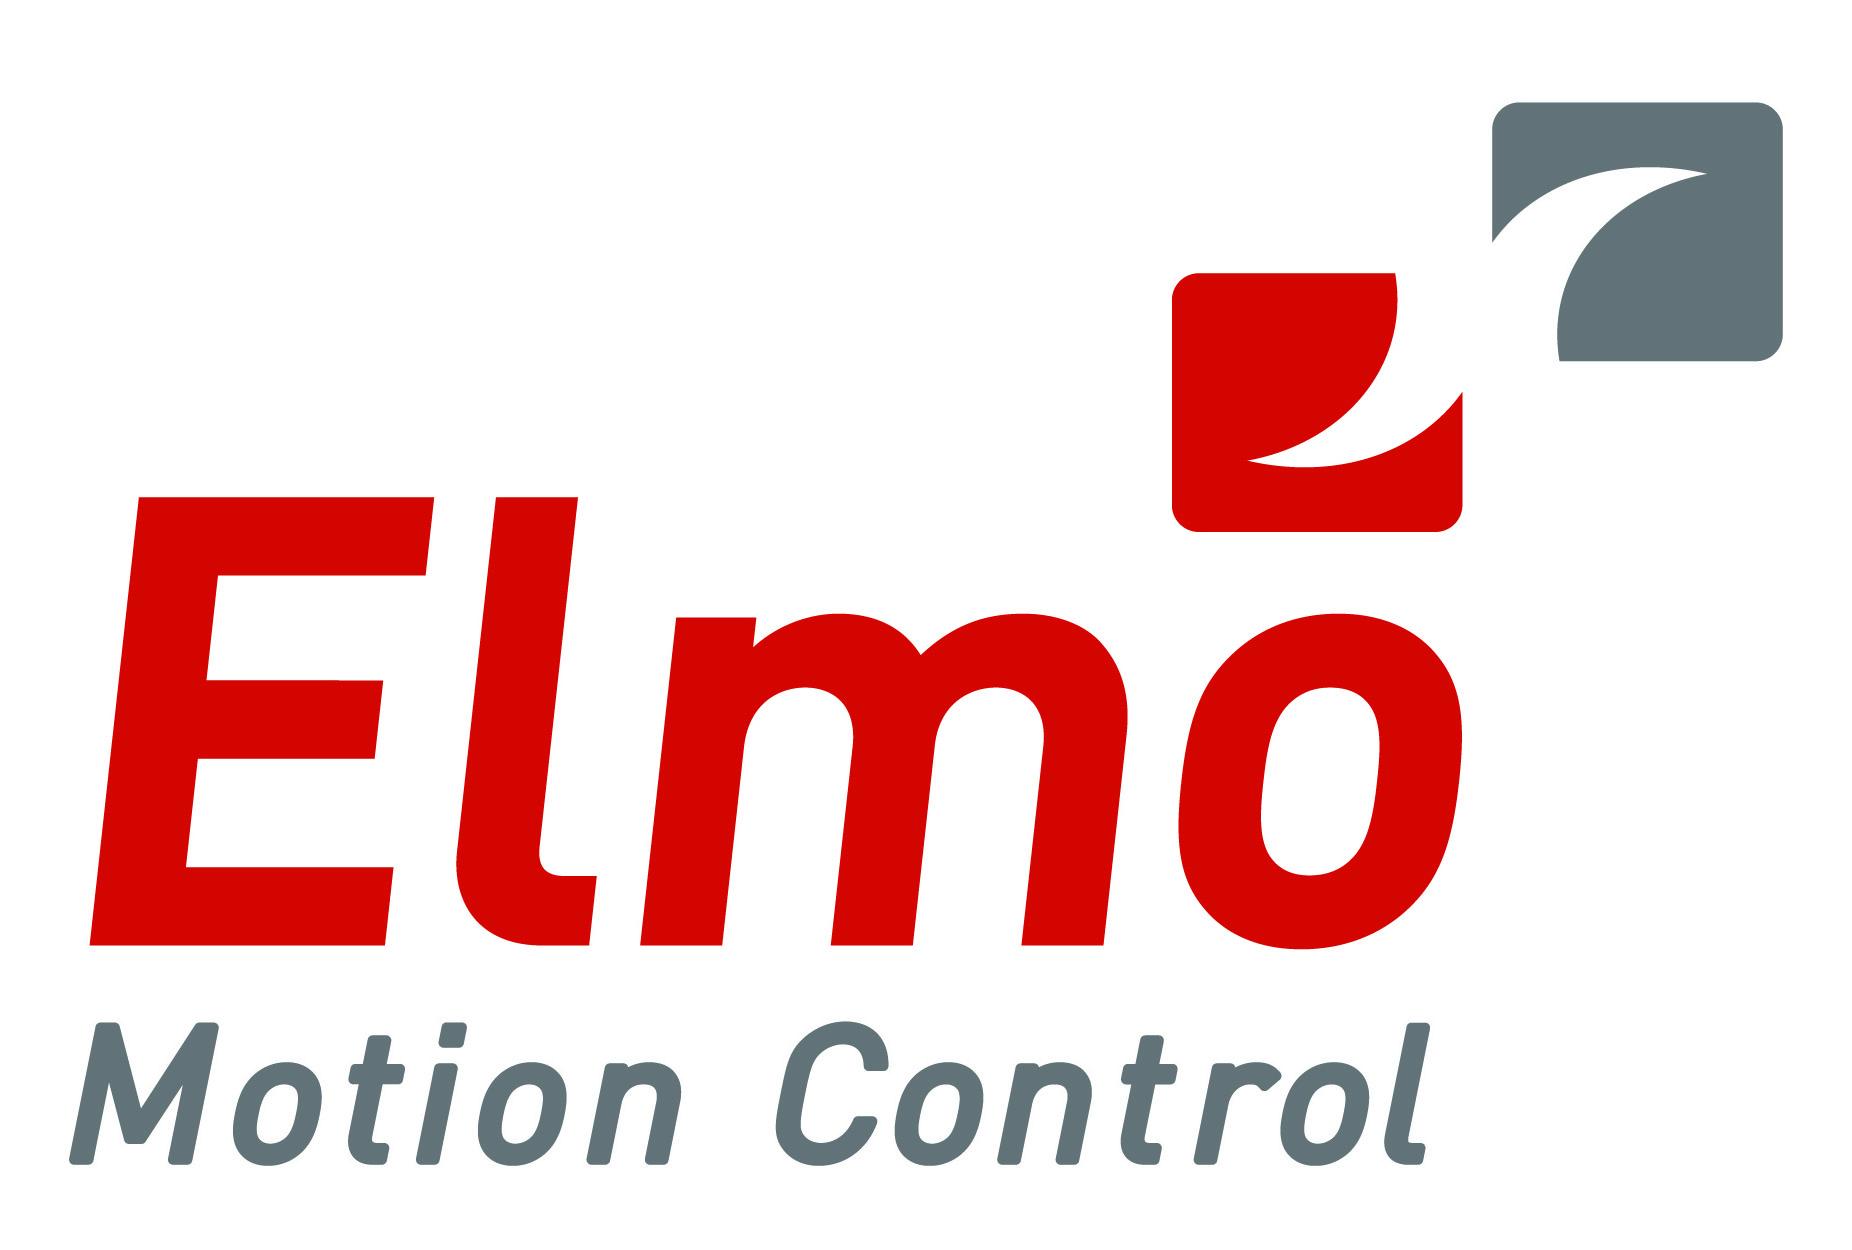 ELMO MOTION CONTROL LTD